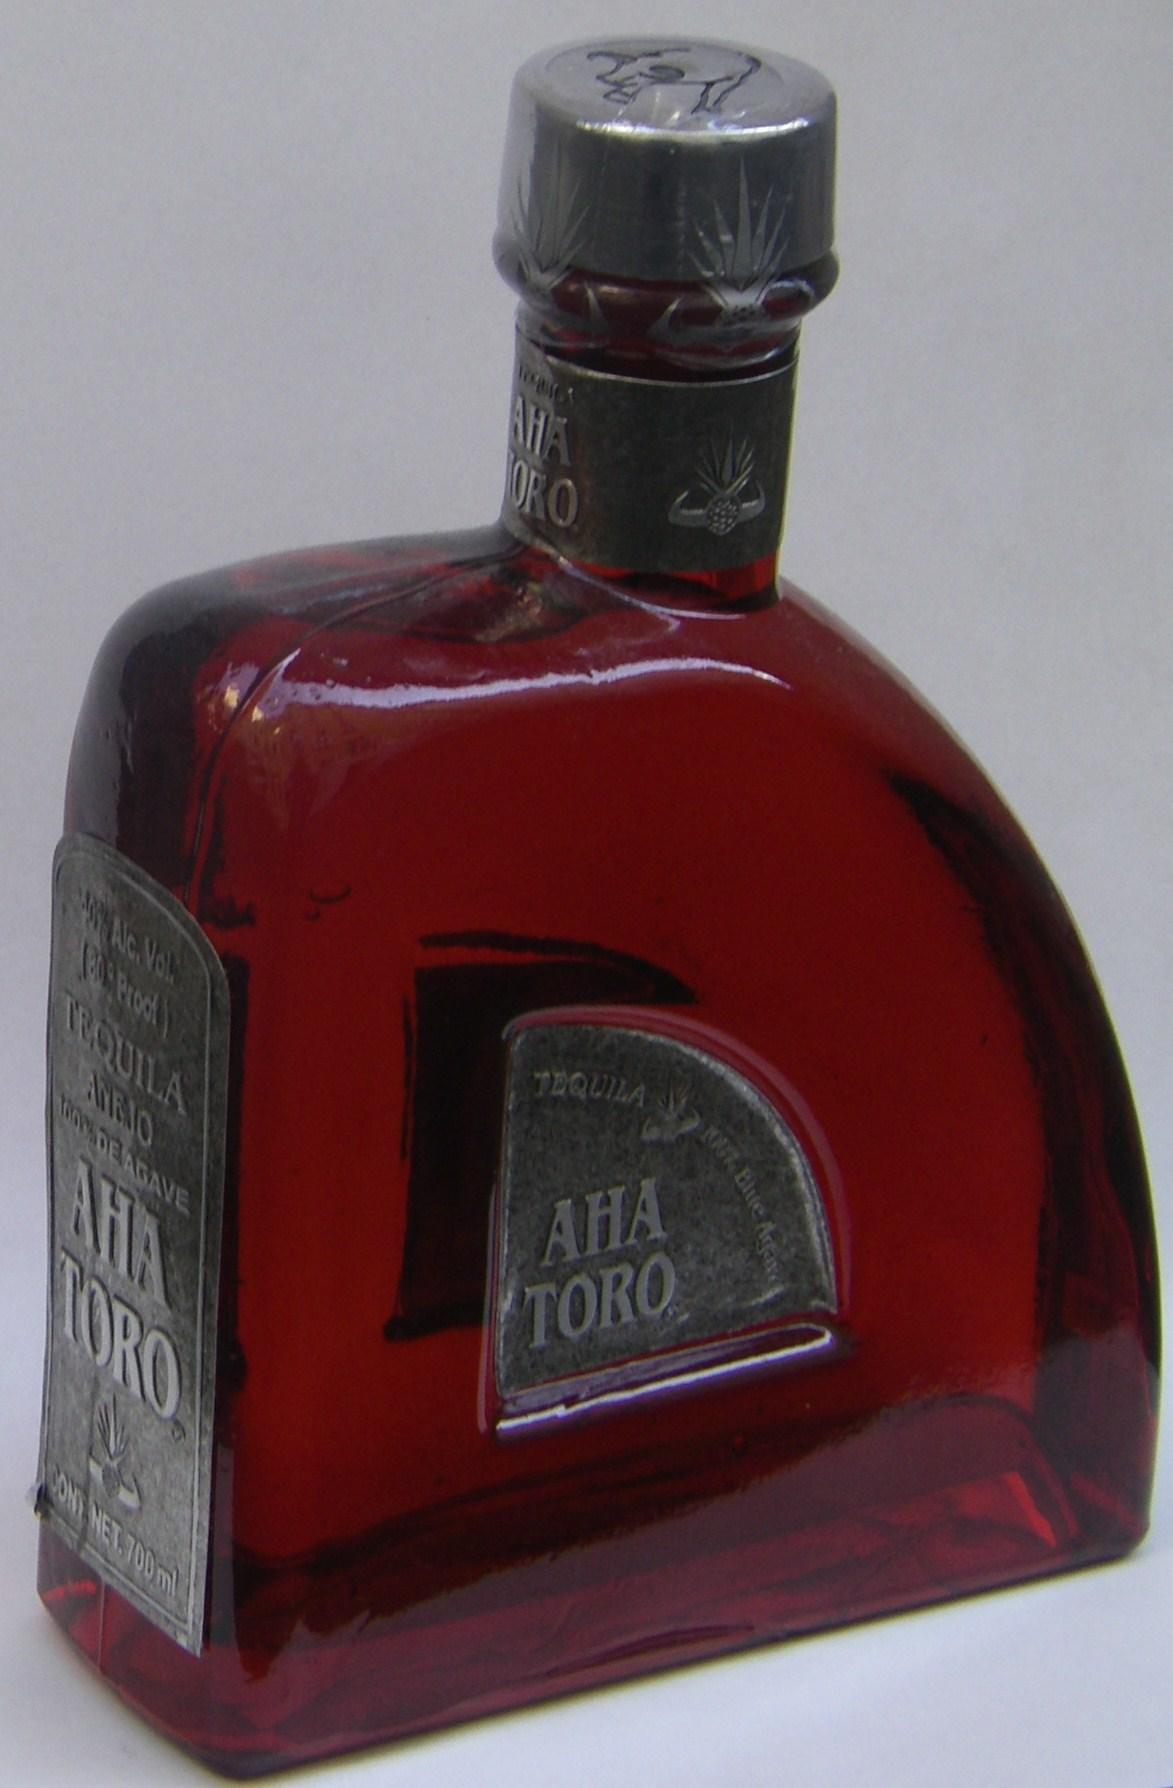 Tequila Aha Toro – Wikipedia